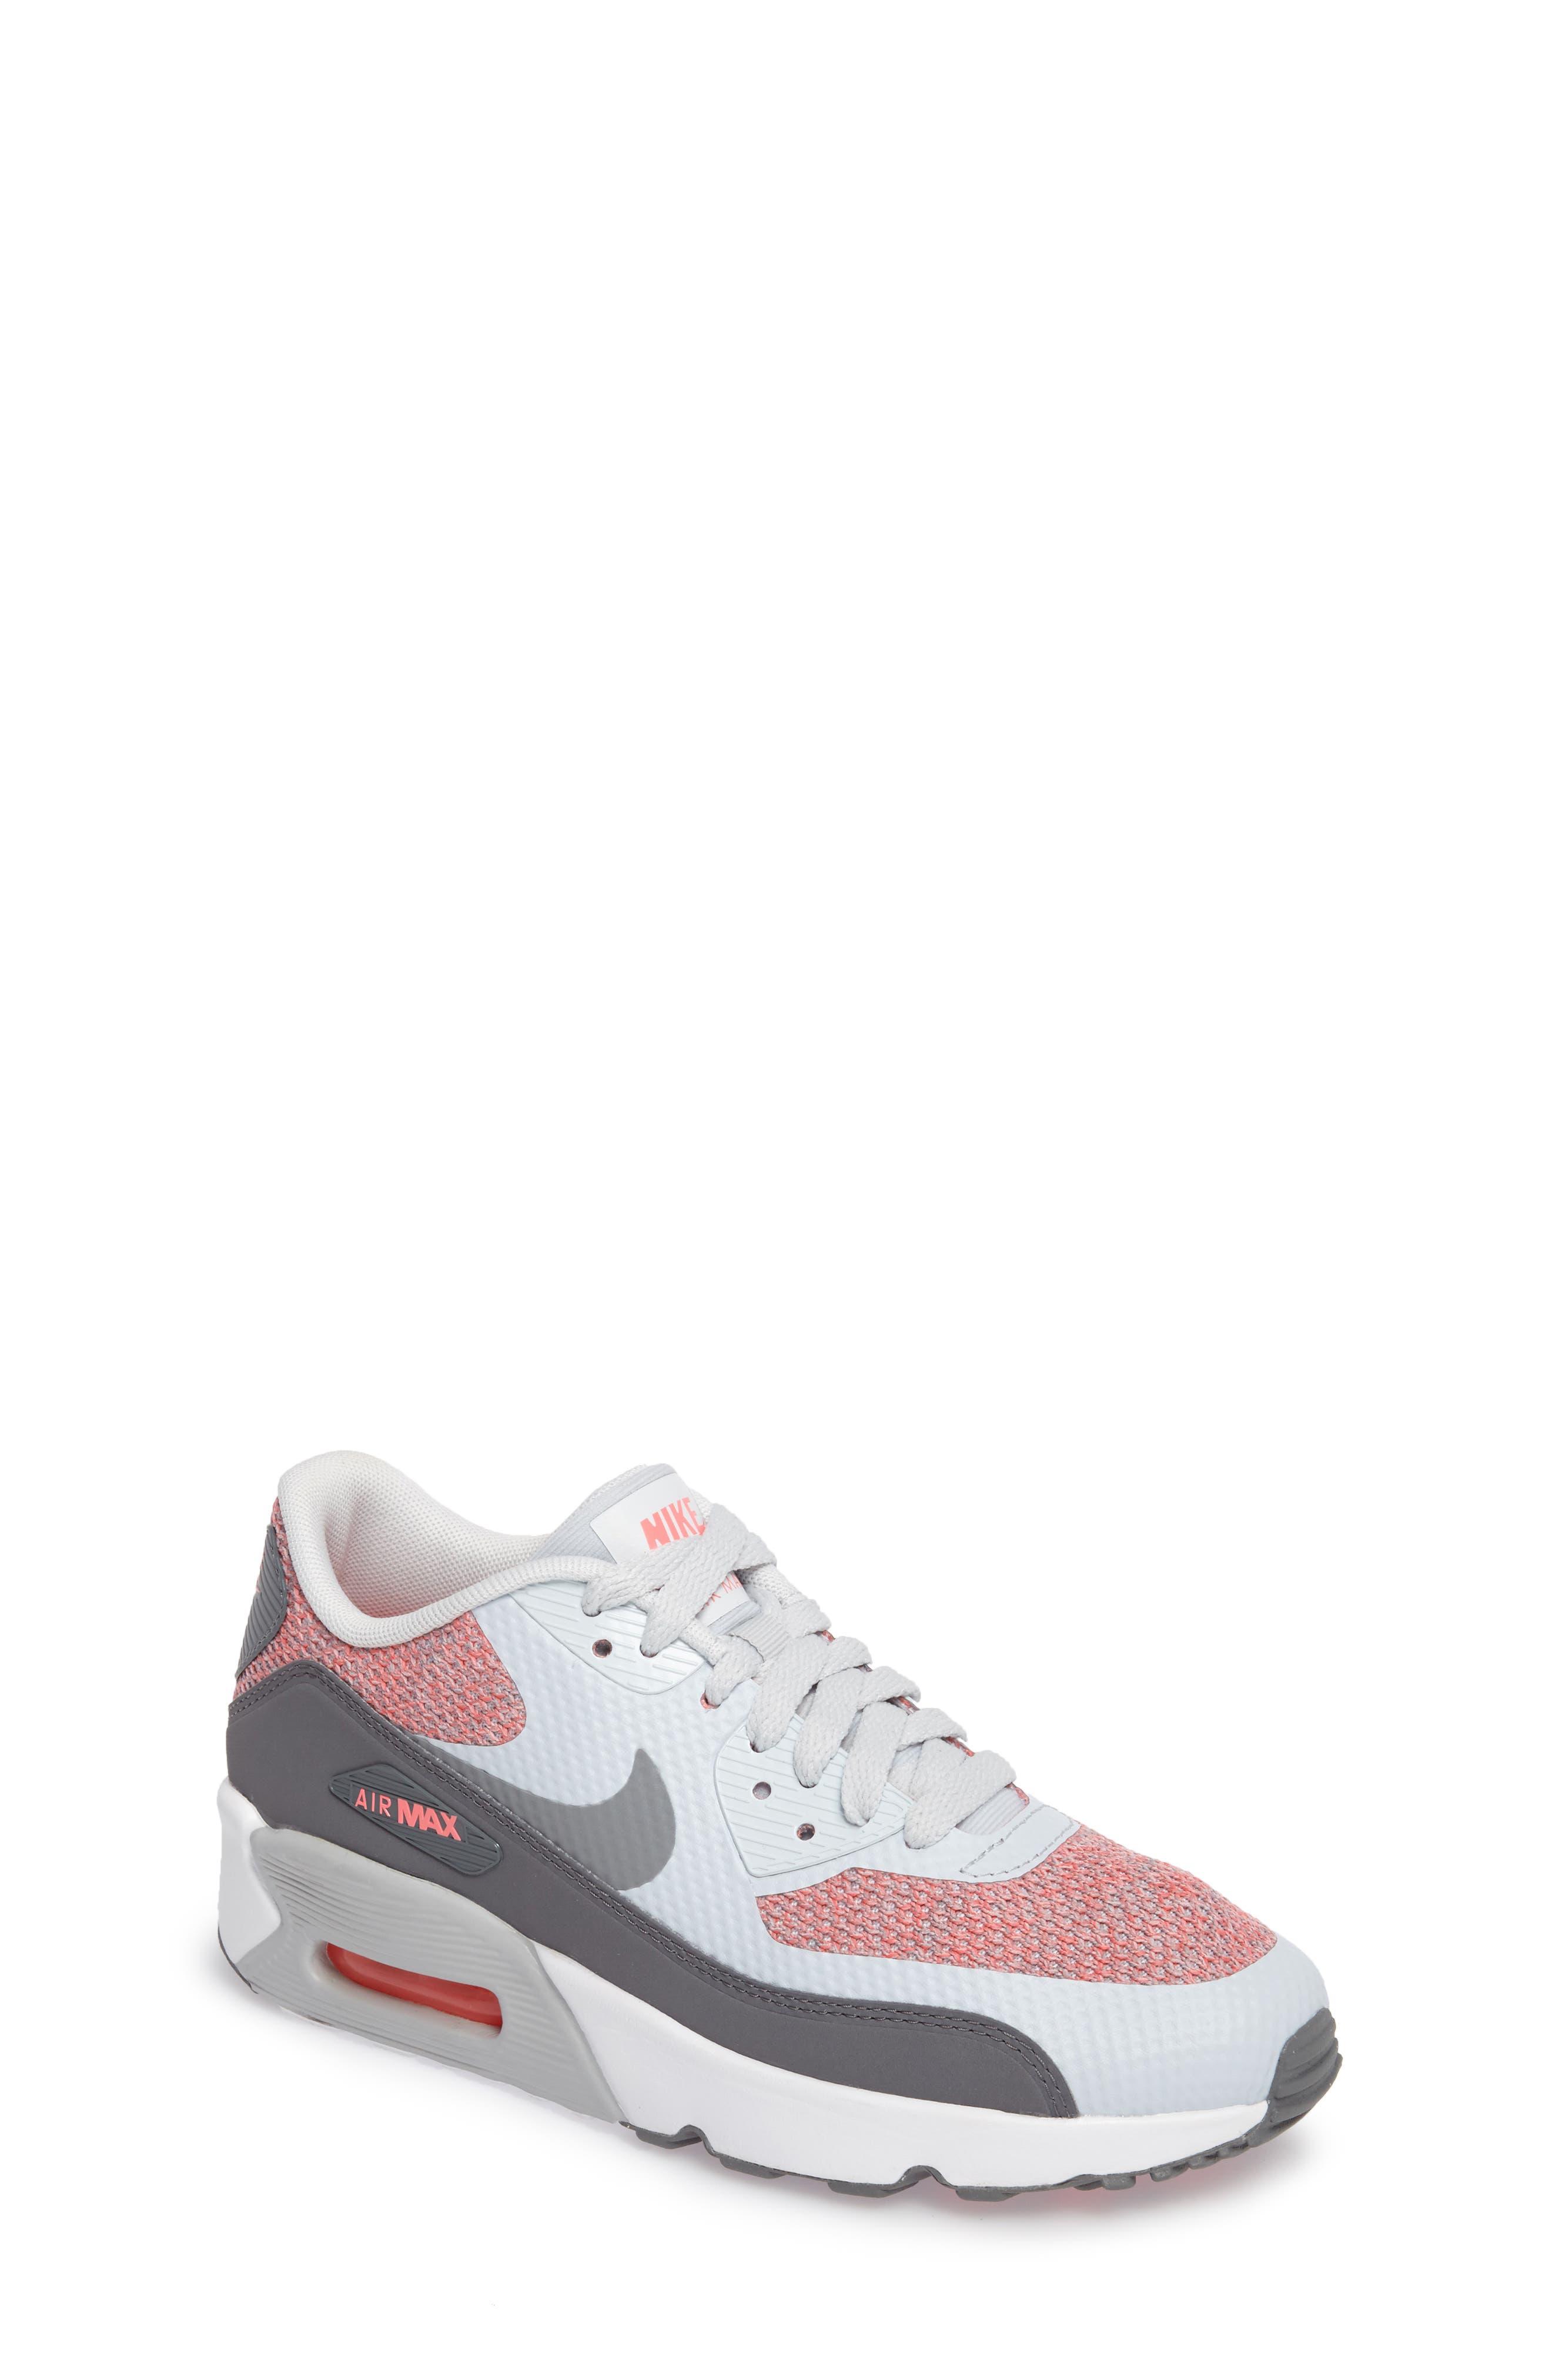 Nike Air Max 90 Ultra 2.0 SE Sneaker (Big Kid)